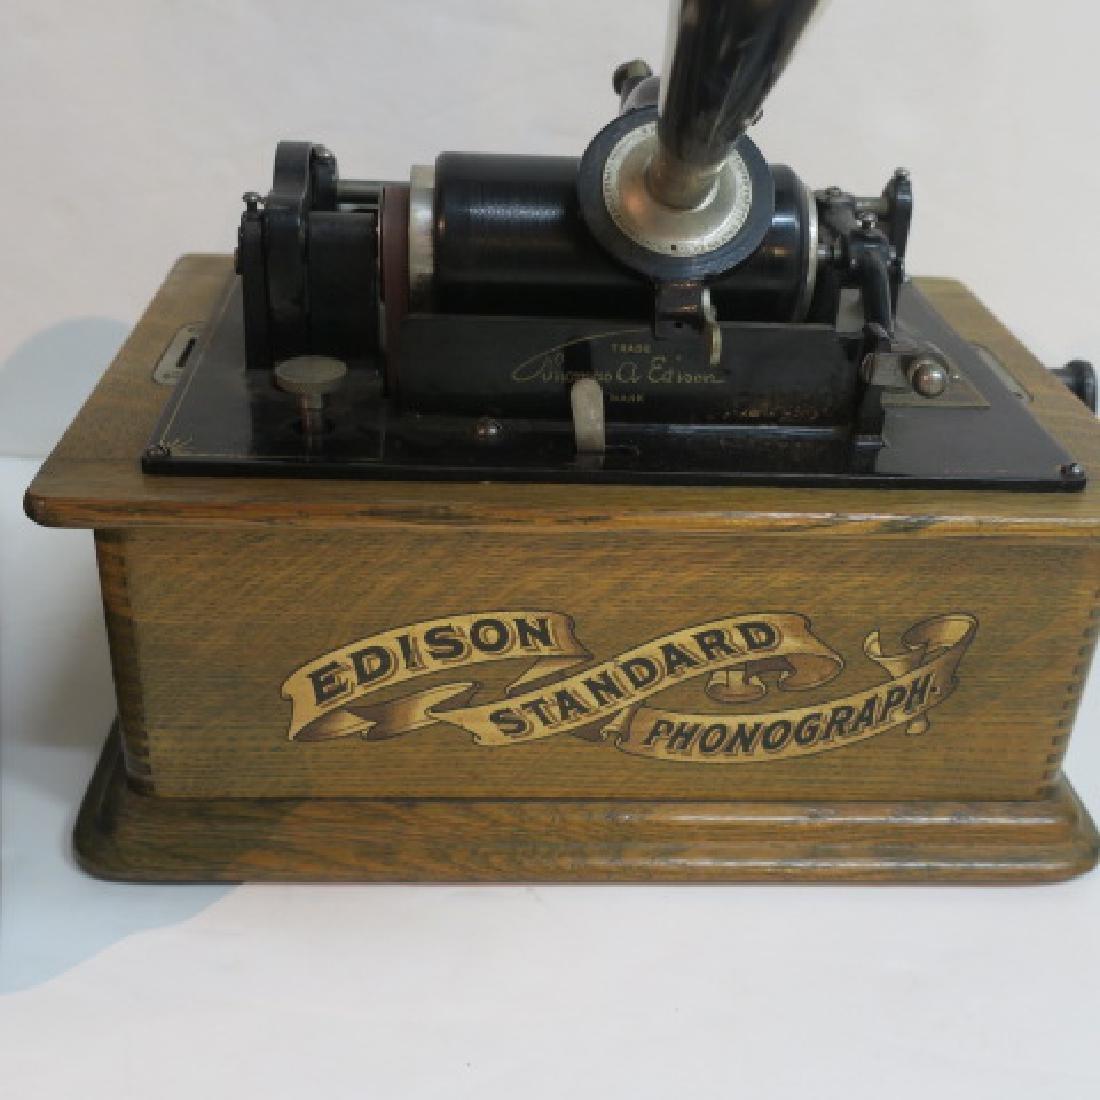 EDISON STANDARD PHONOGRAPH CYLINDER MACHINE CA1910 - 2